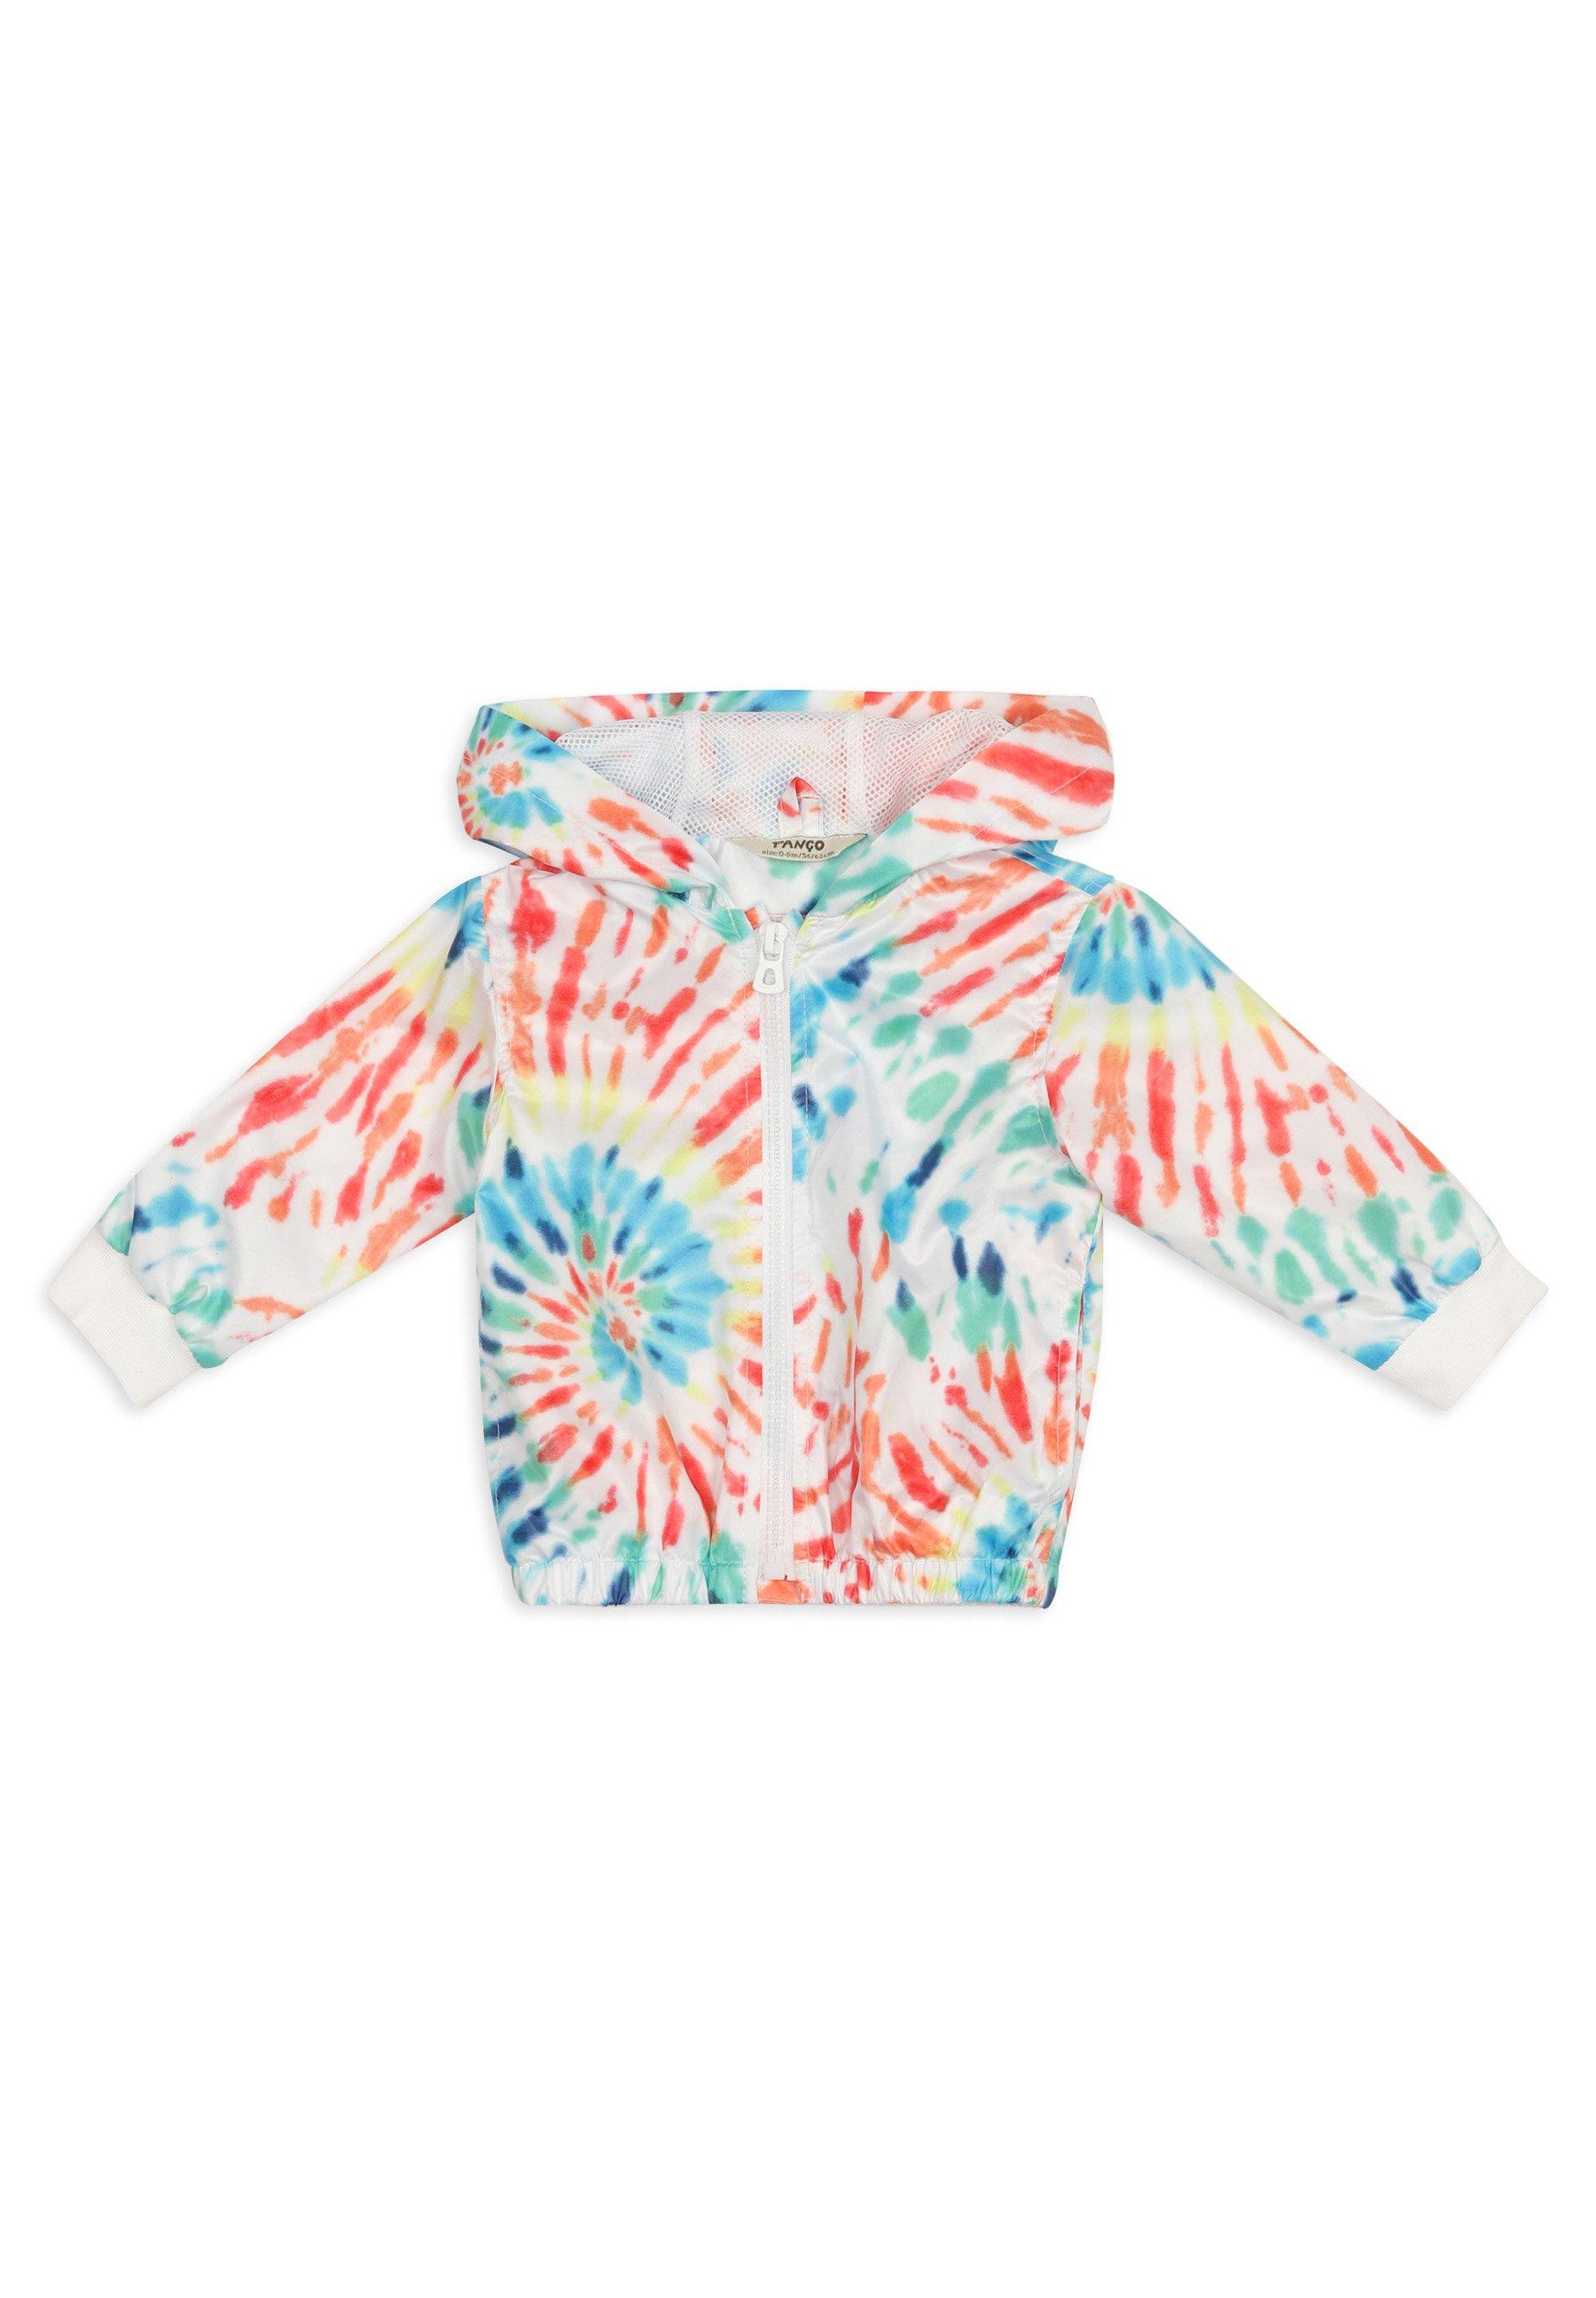 Kinder MIT BATIKMUSTER - Regenjacke / wasserabweisende Jacke